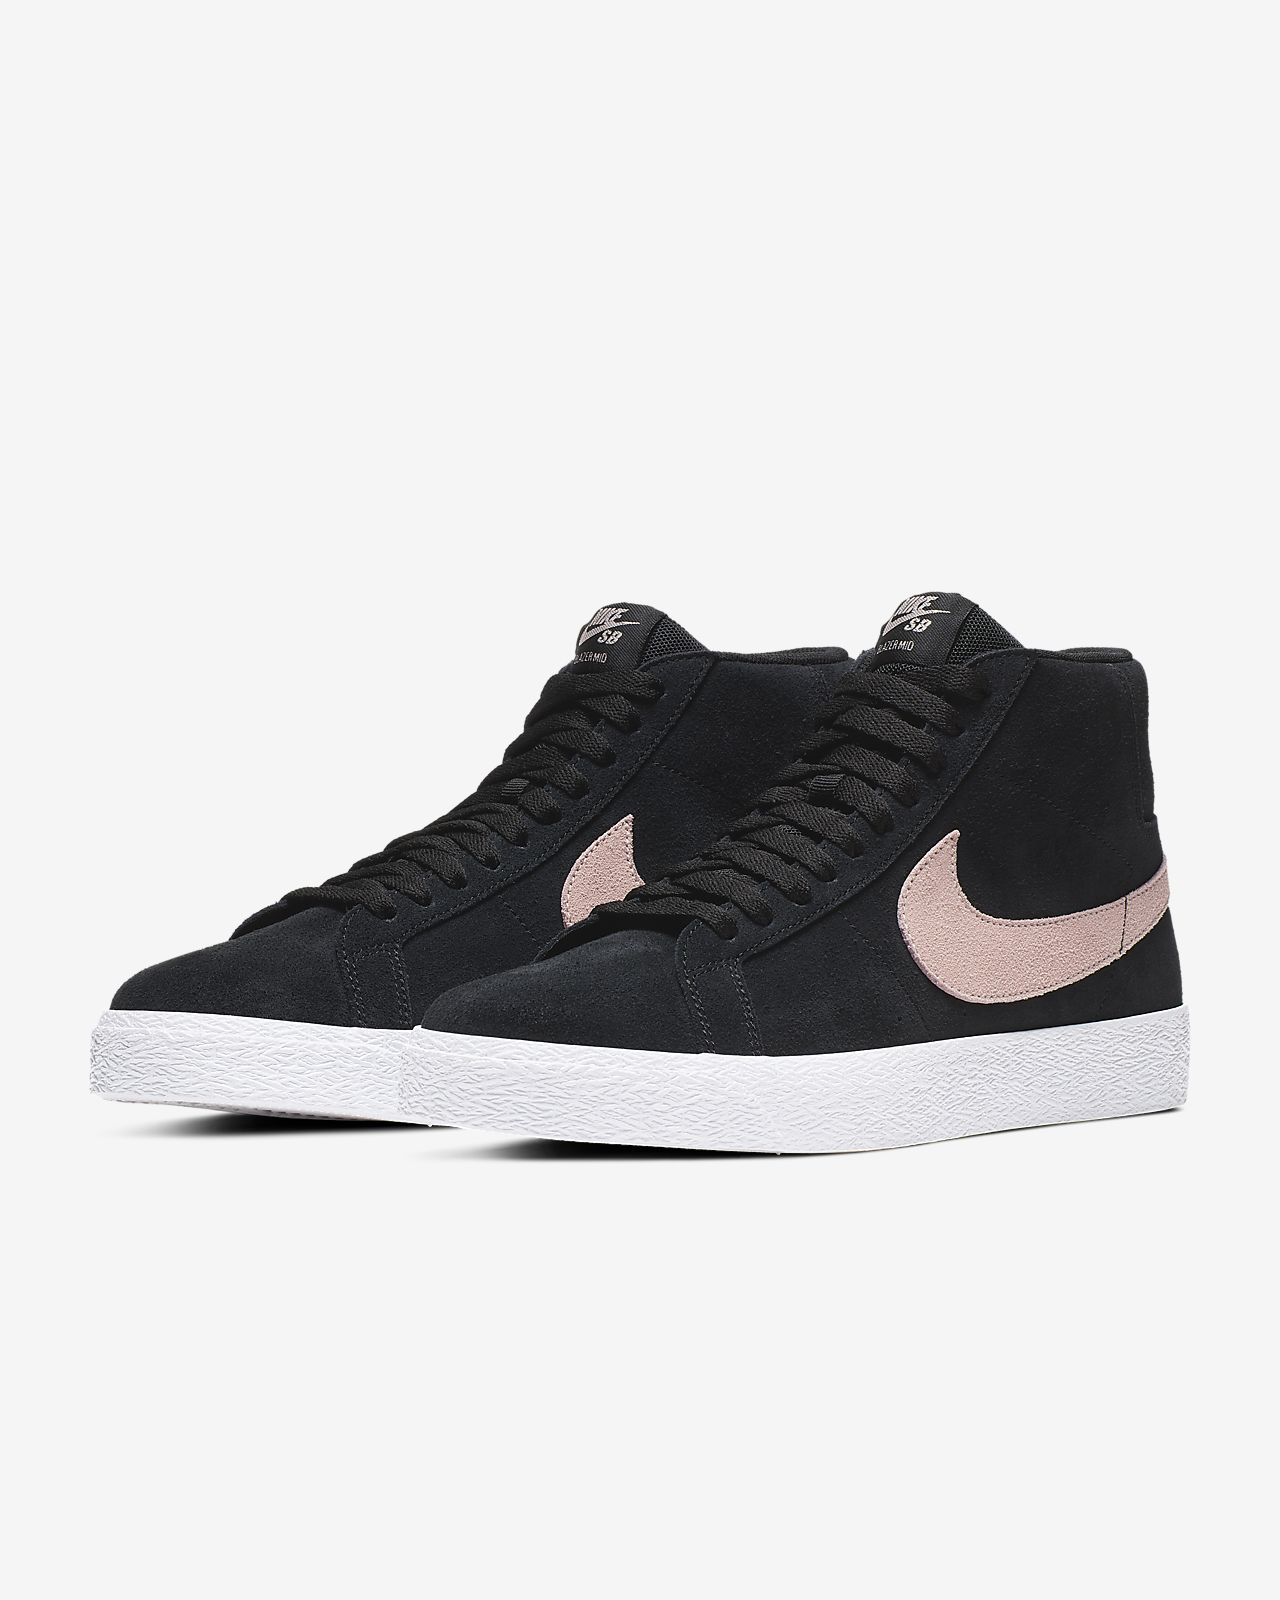 buy online cbe7f 840f1 Nike SB Zoom Blazer Mid Skate Shoe